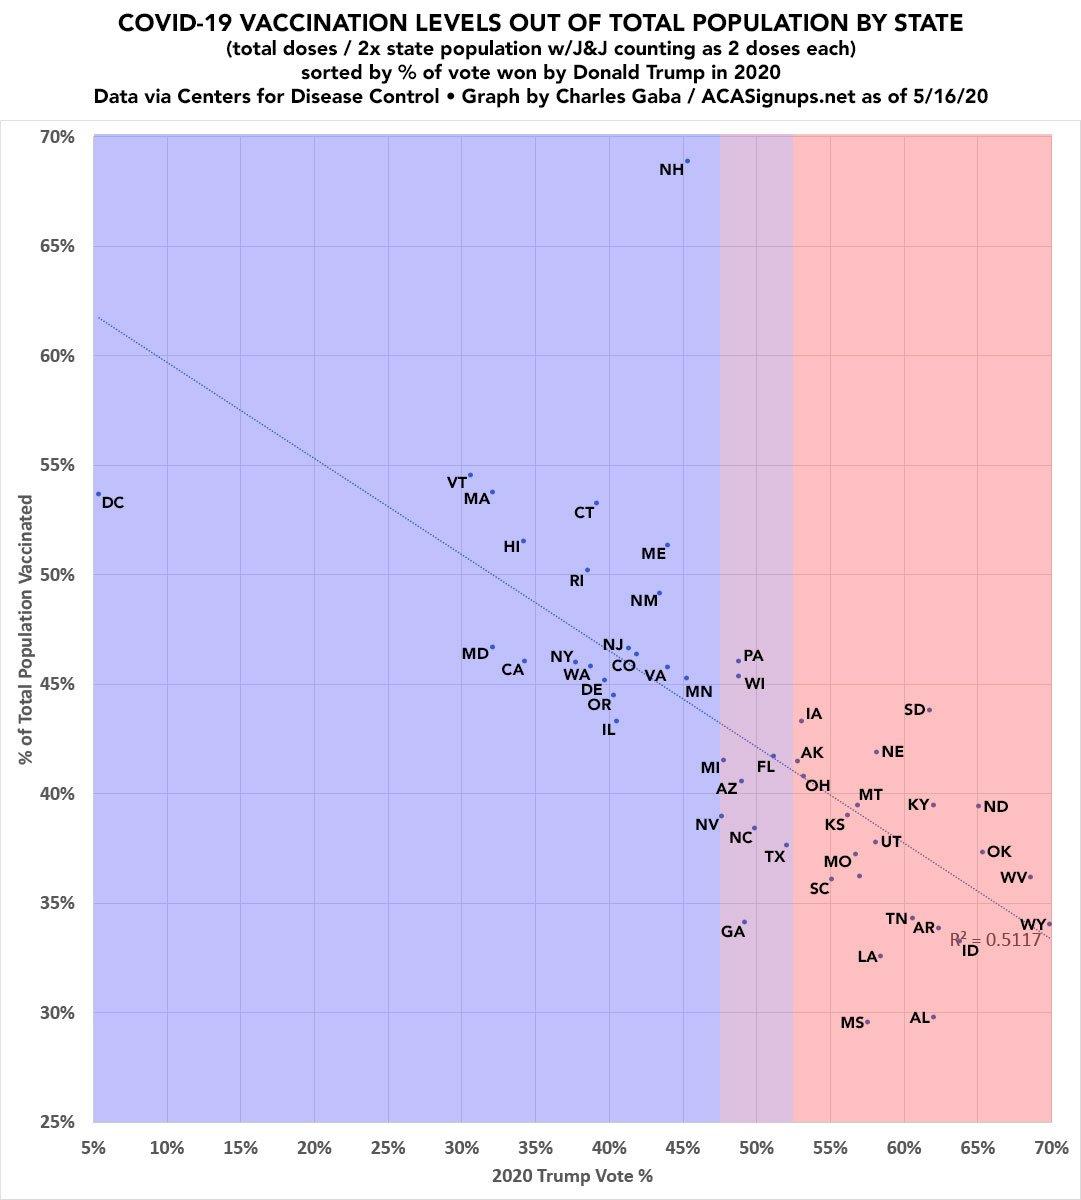 Welp. I figured as much but the visual is pretty striking regardless... https://t.co/J4QTkZuveA